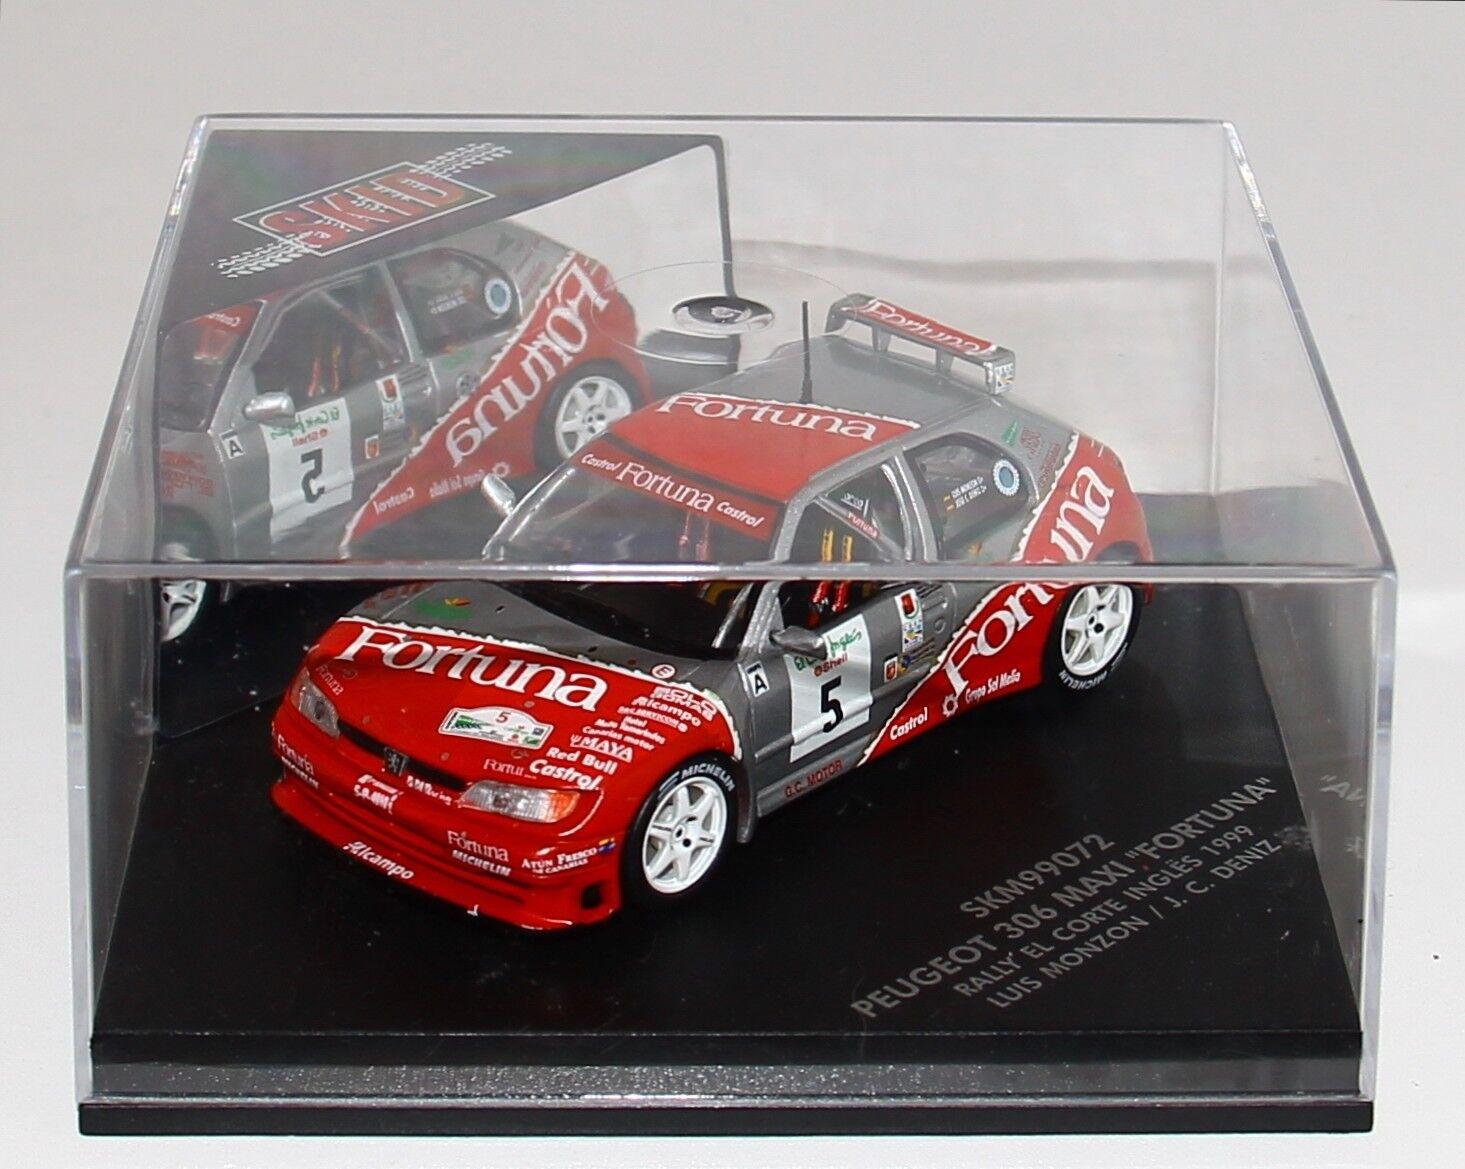 1 43 Vitesse SKM99076 Peugeot 306 Maxi Rallye El Corte Ingles 1999 Monzon